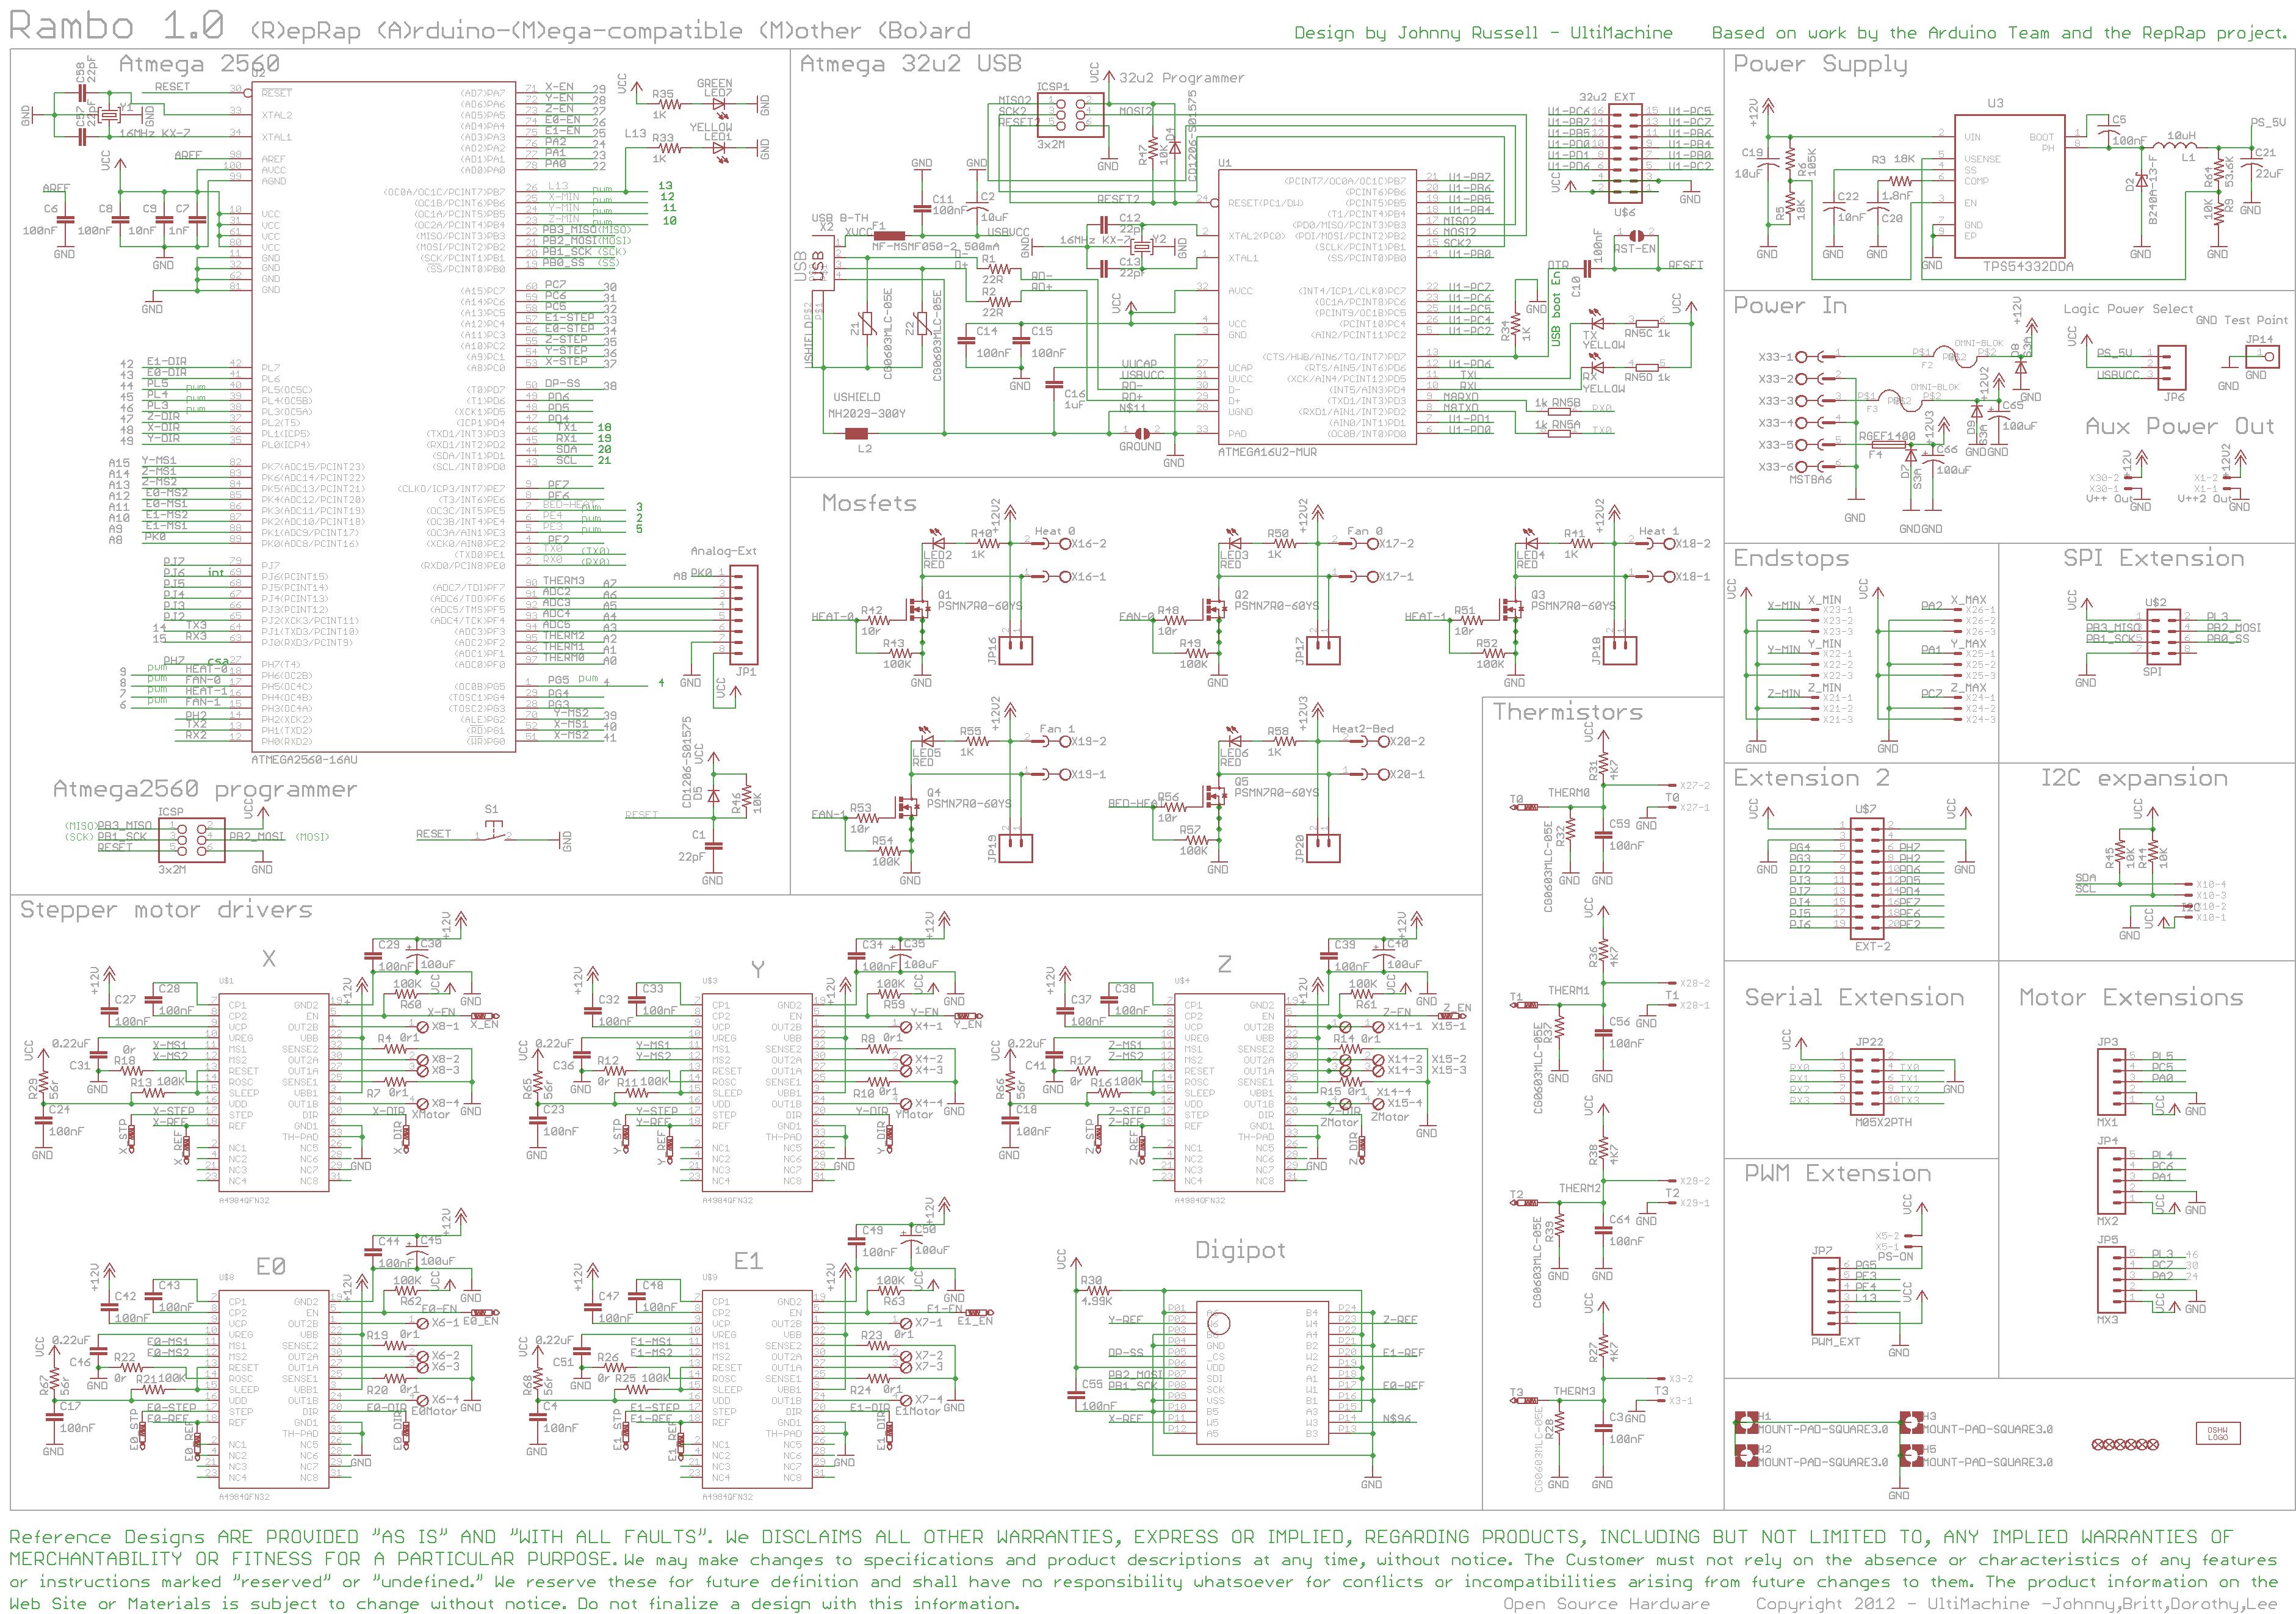 rambo 2560 3d printer list